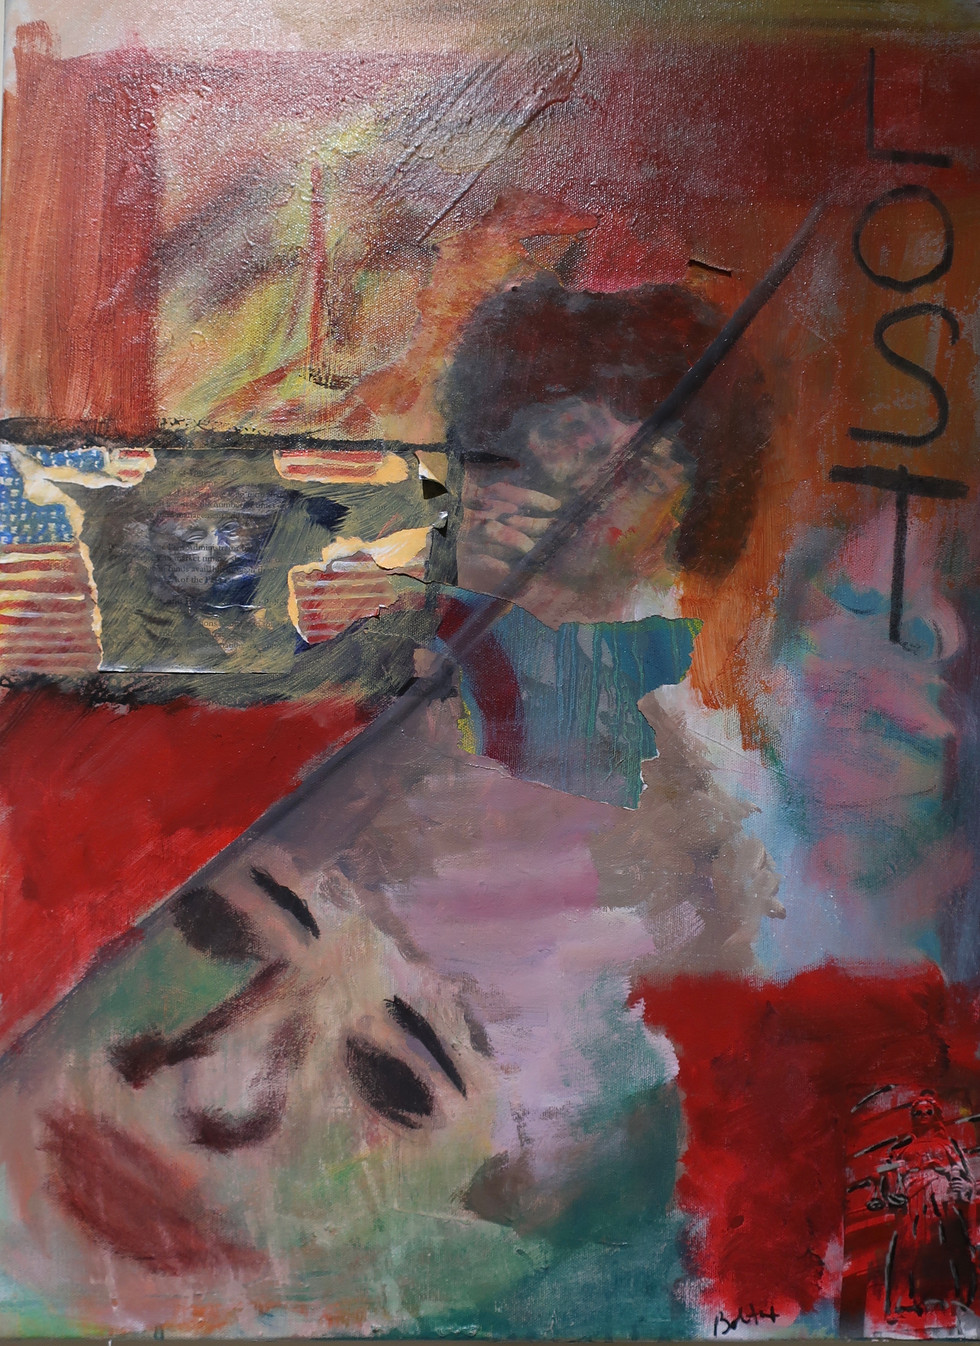 Angela Davis / Lost